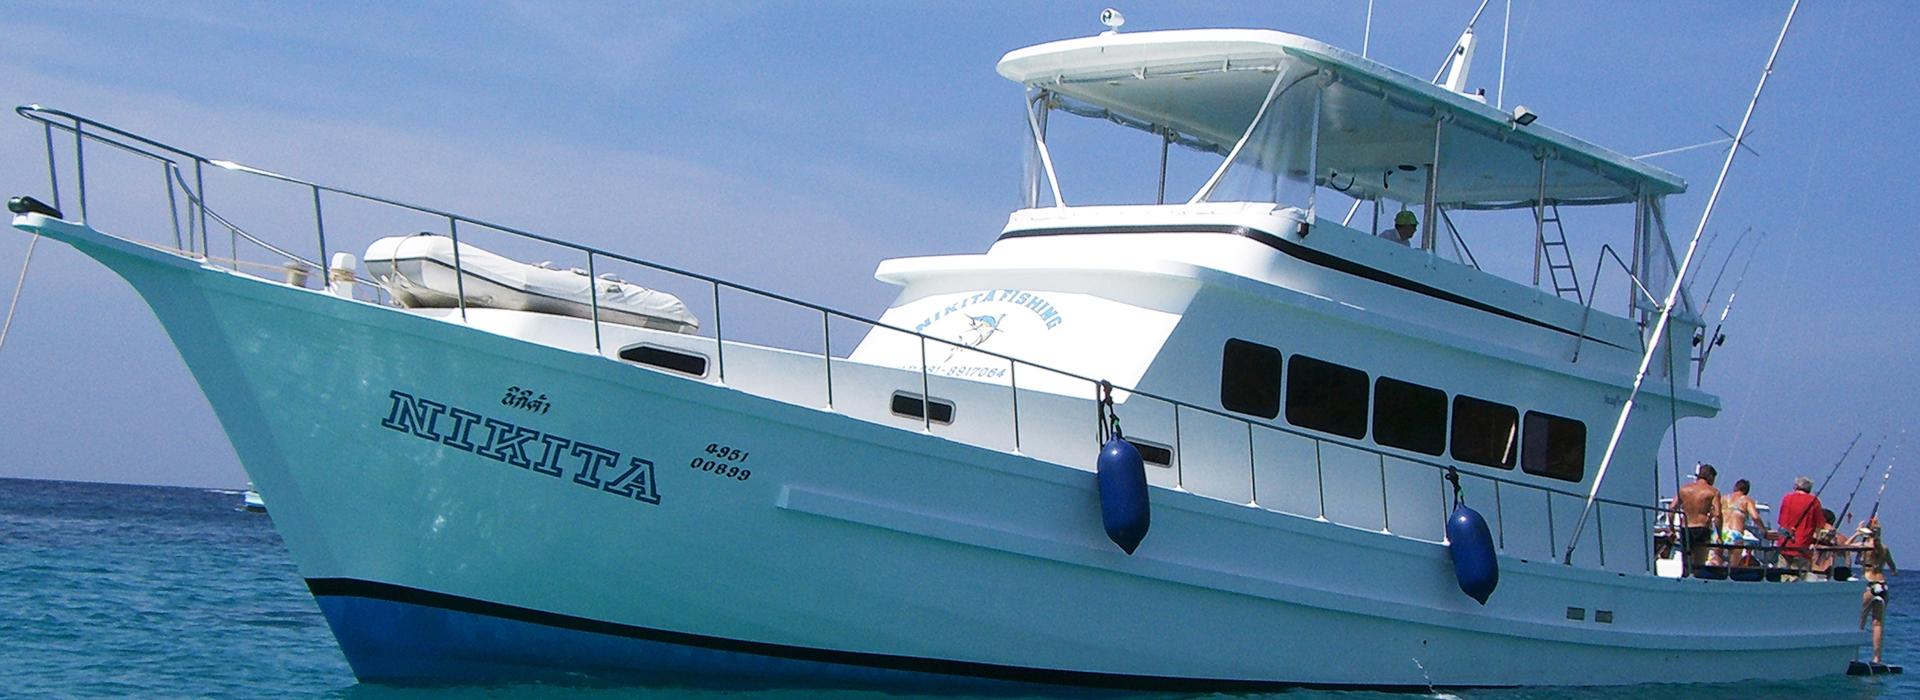 Nikita sports fishing charter